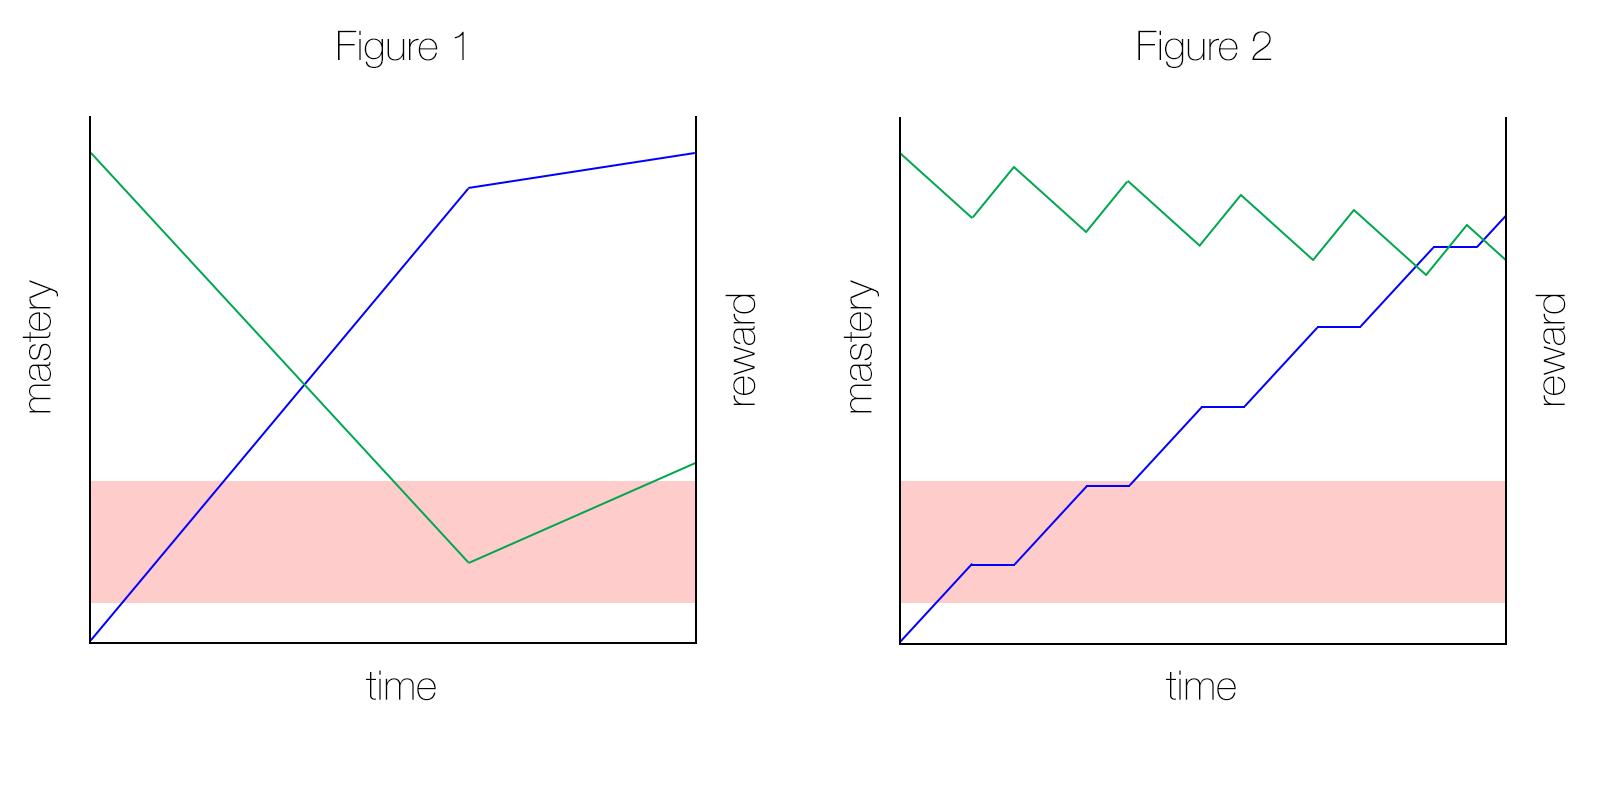 Mastery vs. Reward, Figure 1 and 2